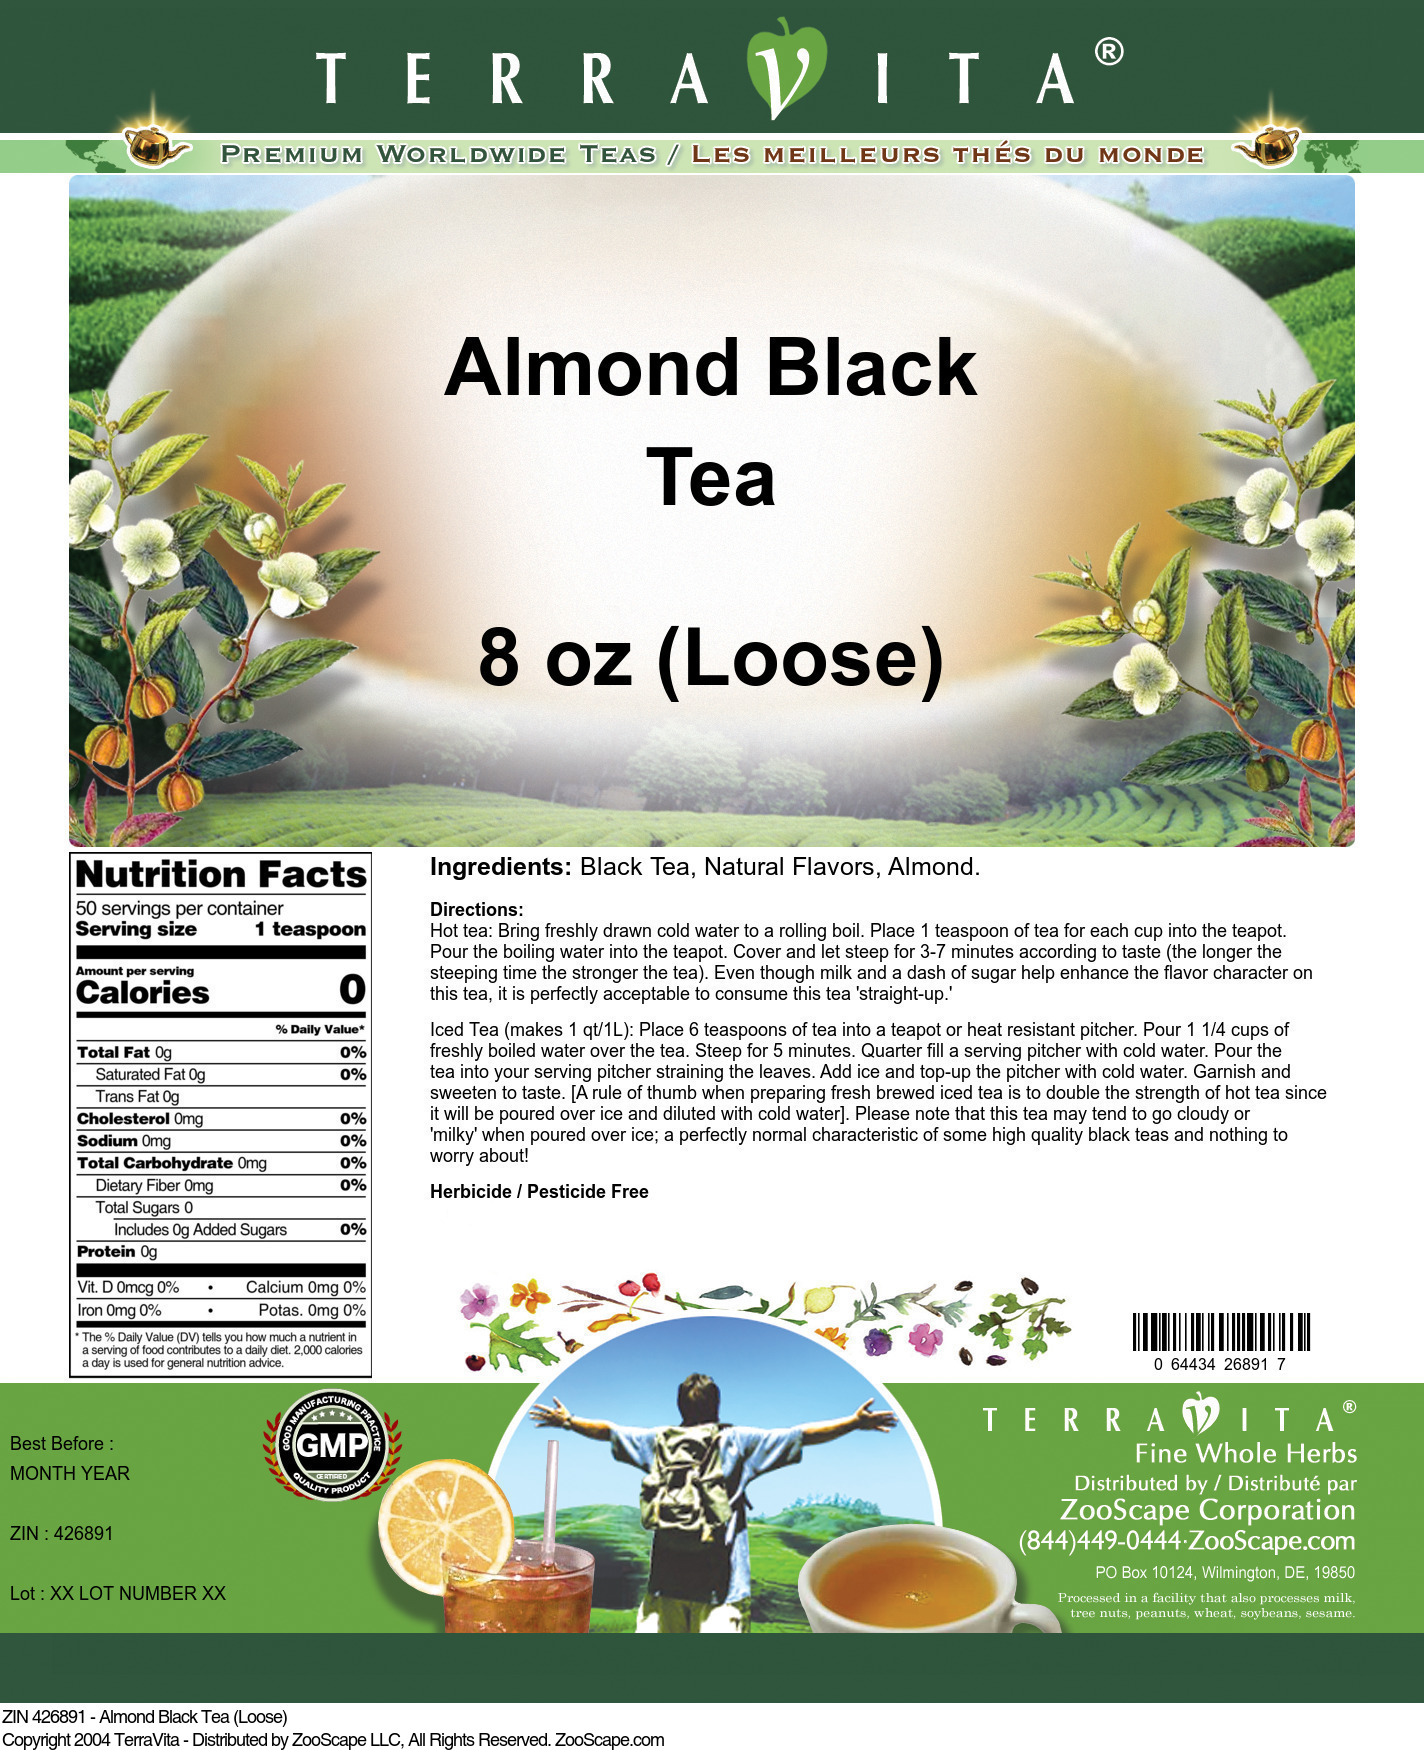 Almond Black Tea (Loose) - Label